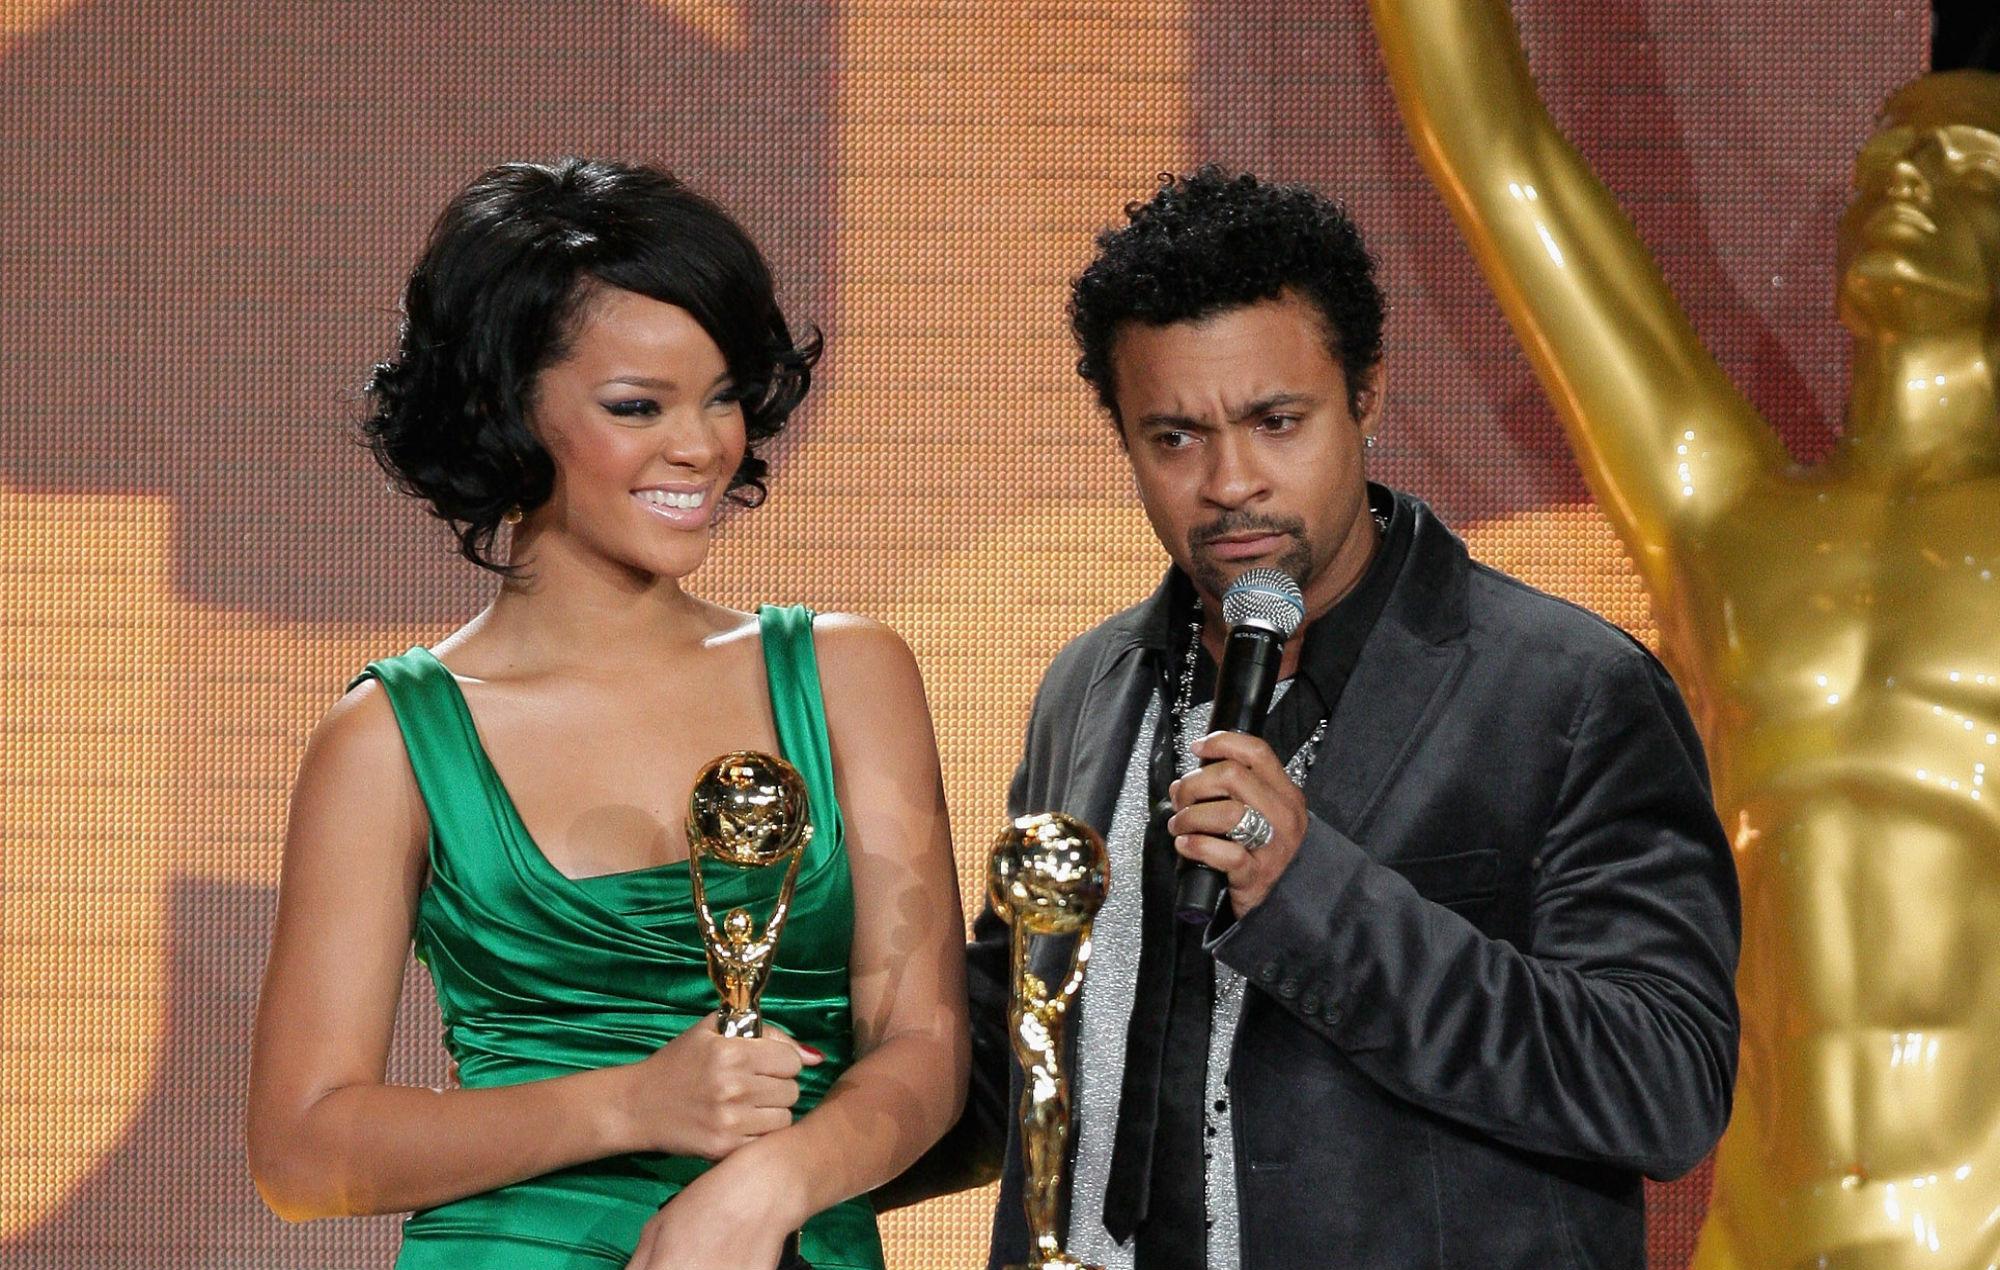 Rihanna Shaggy WMA 2007